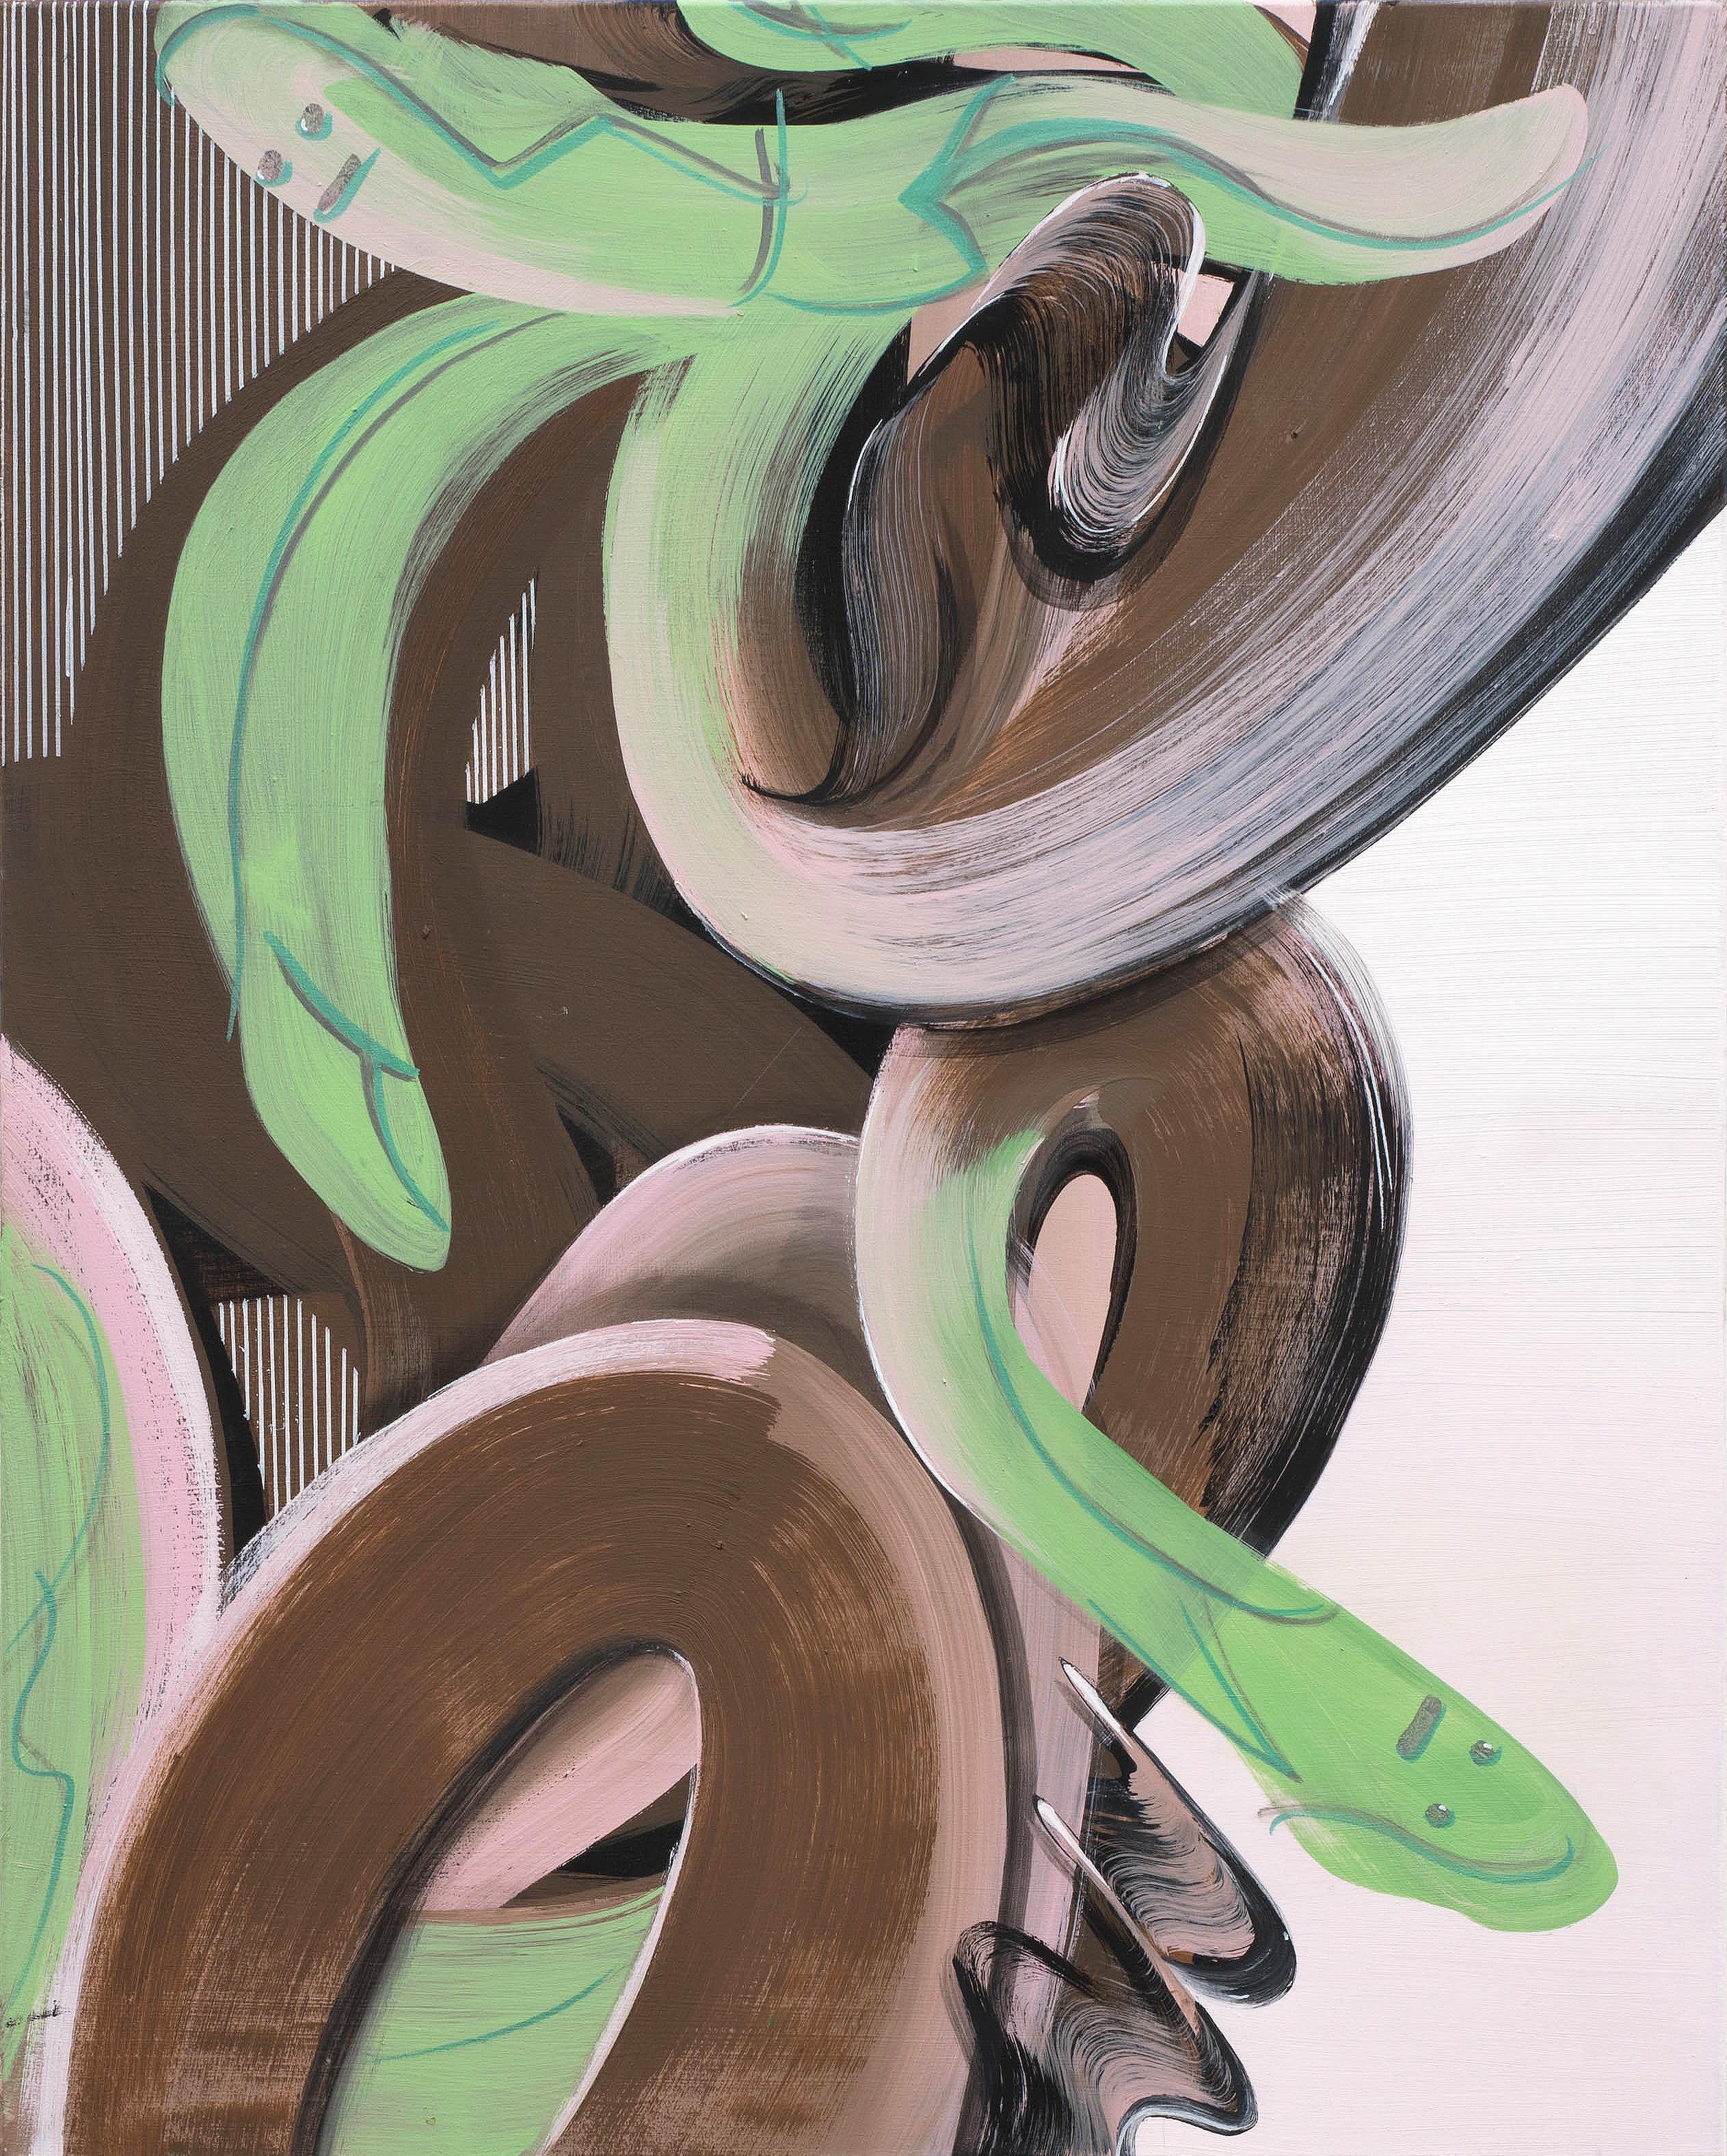 Janine van Oene / Gummy Worms